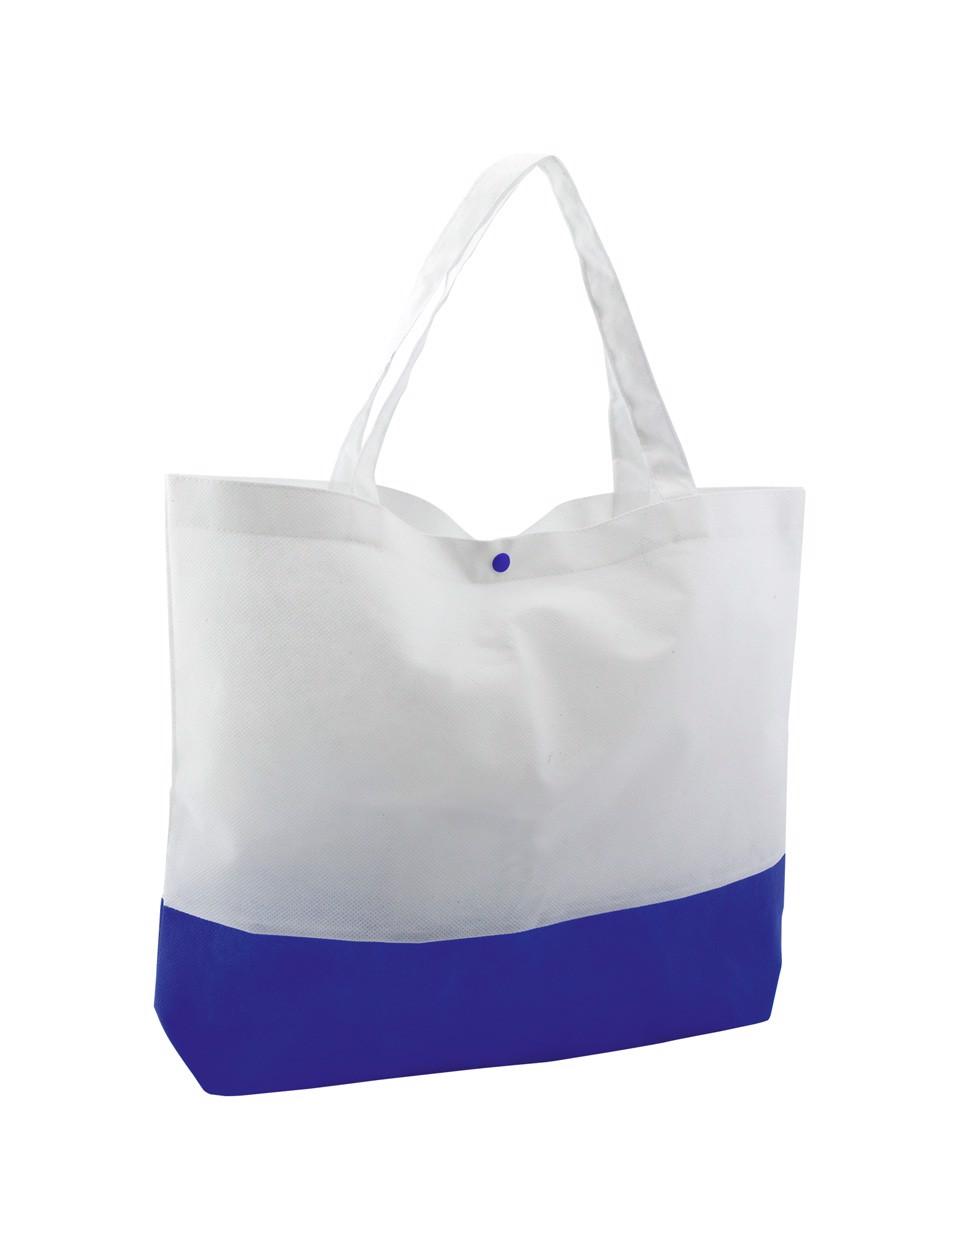 Geanta De Plaja Bagster - Alb / Albastru